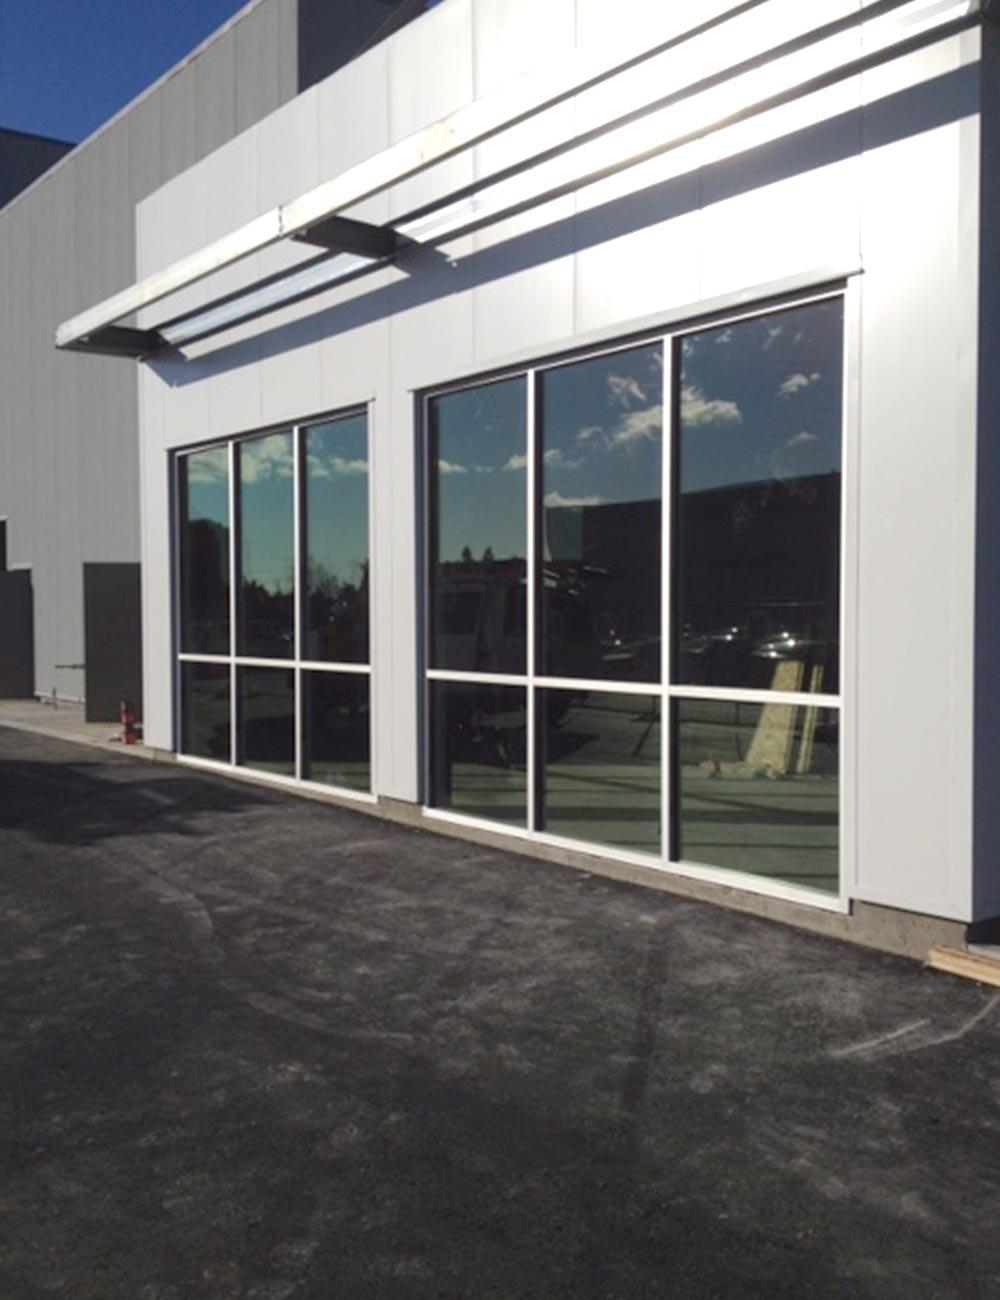 Kia Fiat Glass Office Windows